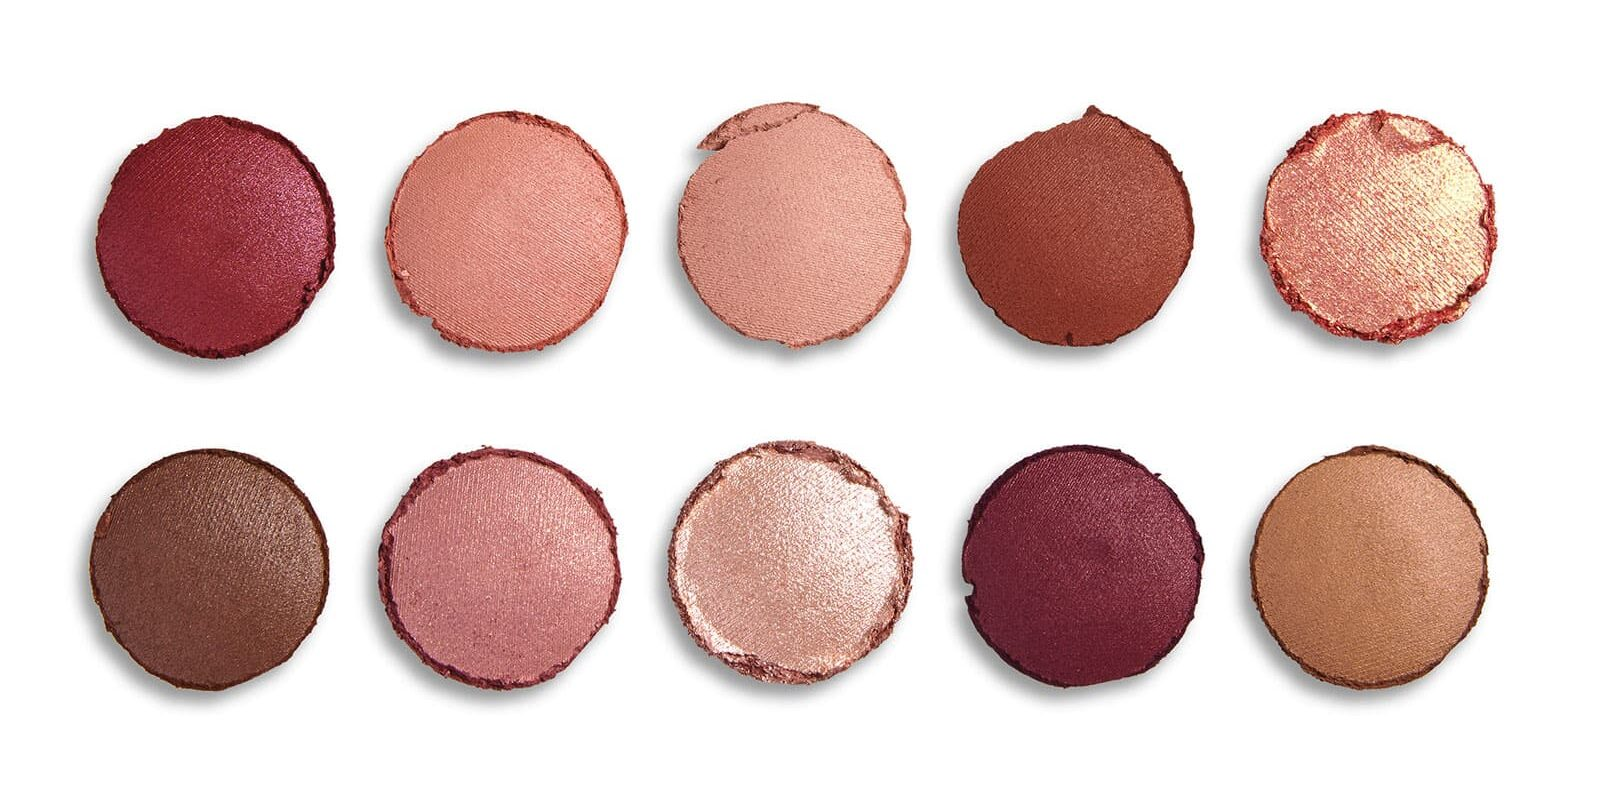 Revolution Pro Nude on Nude Colour Focus Palette